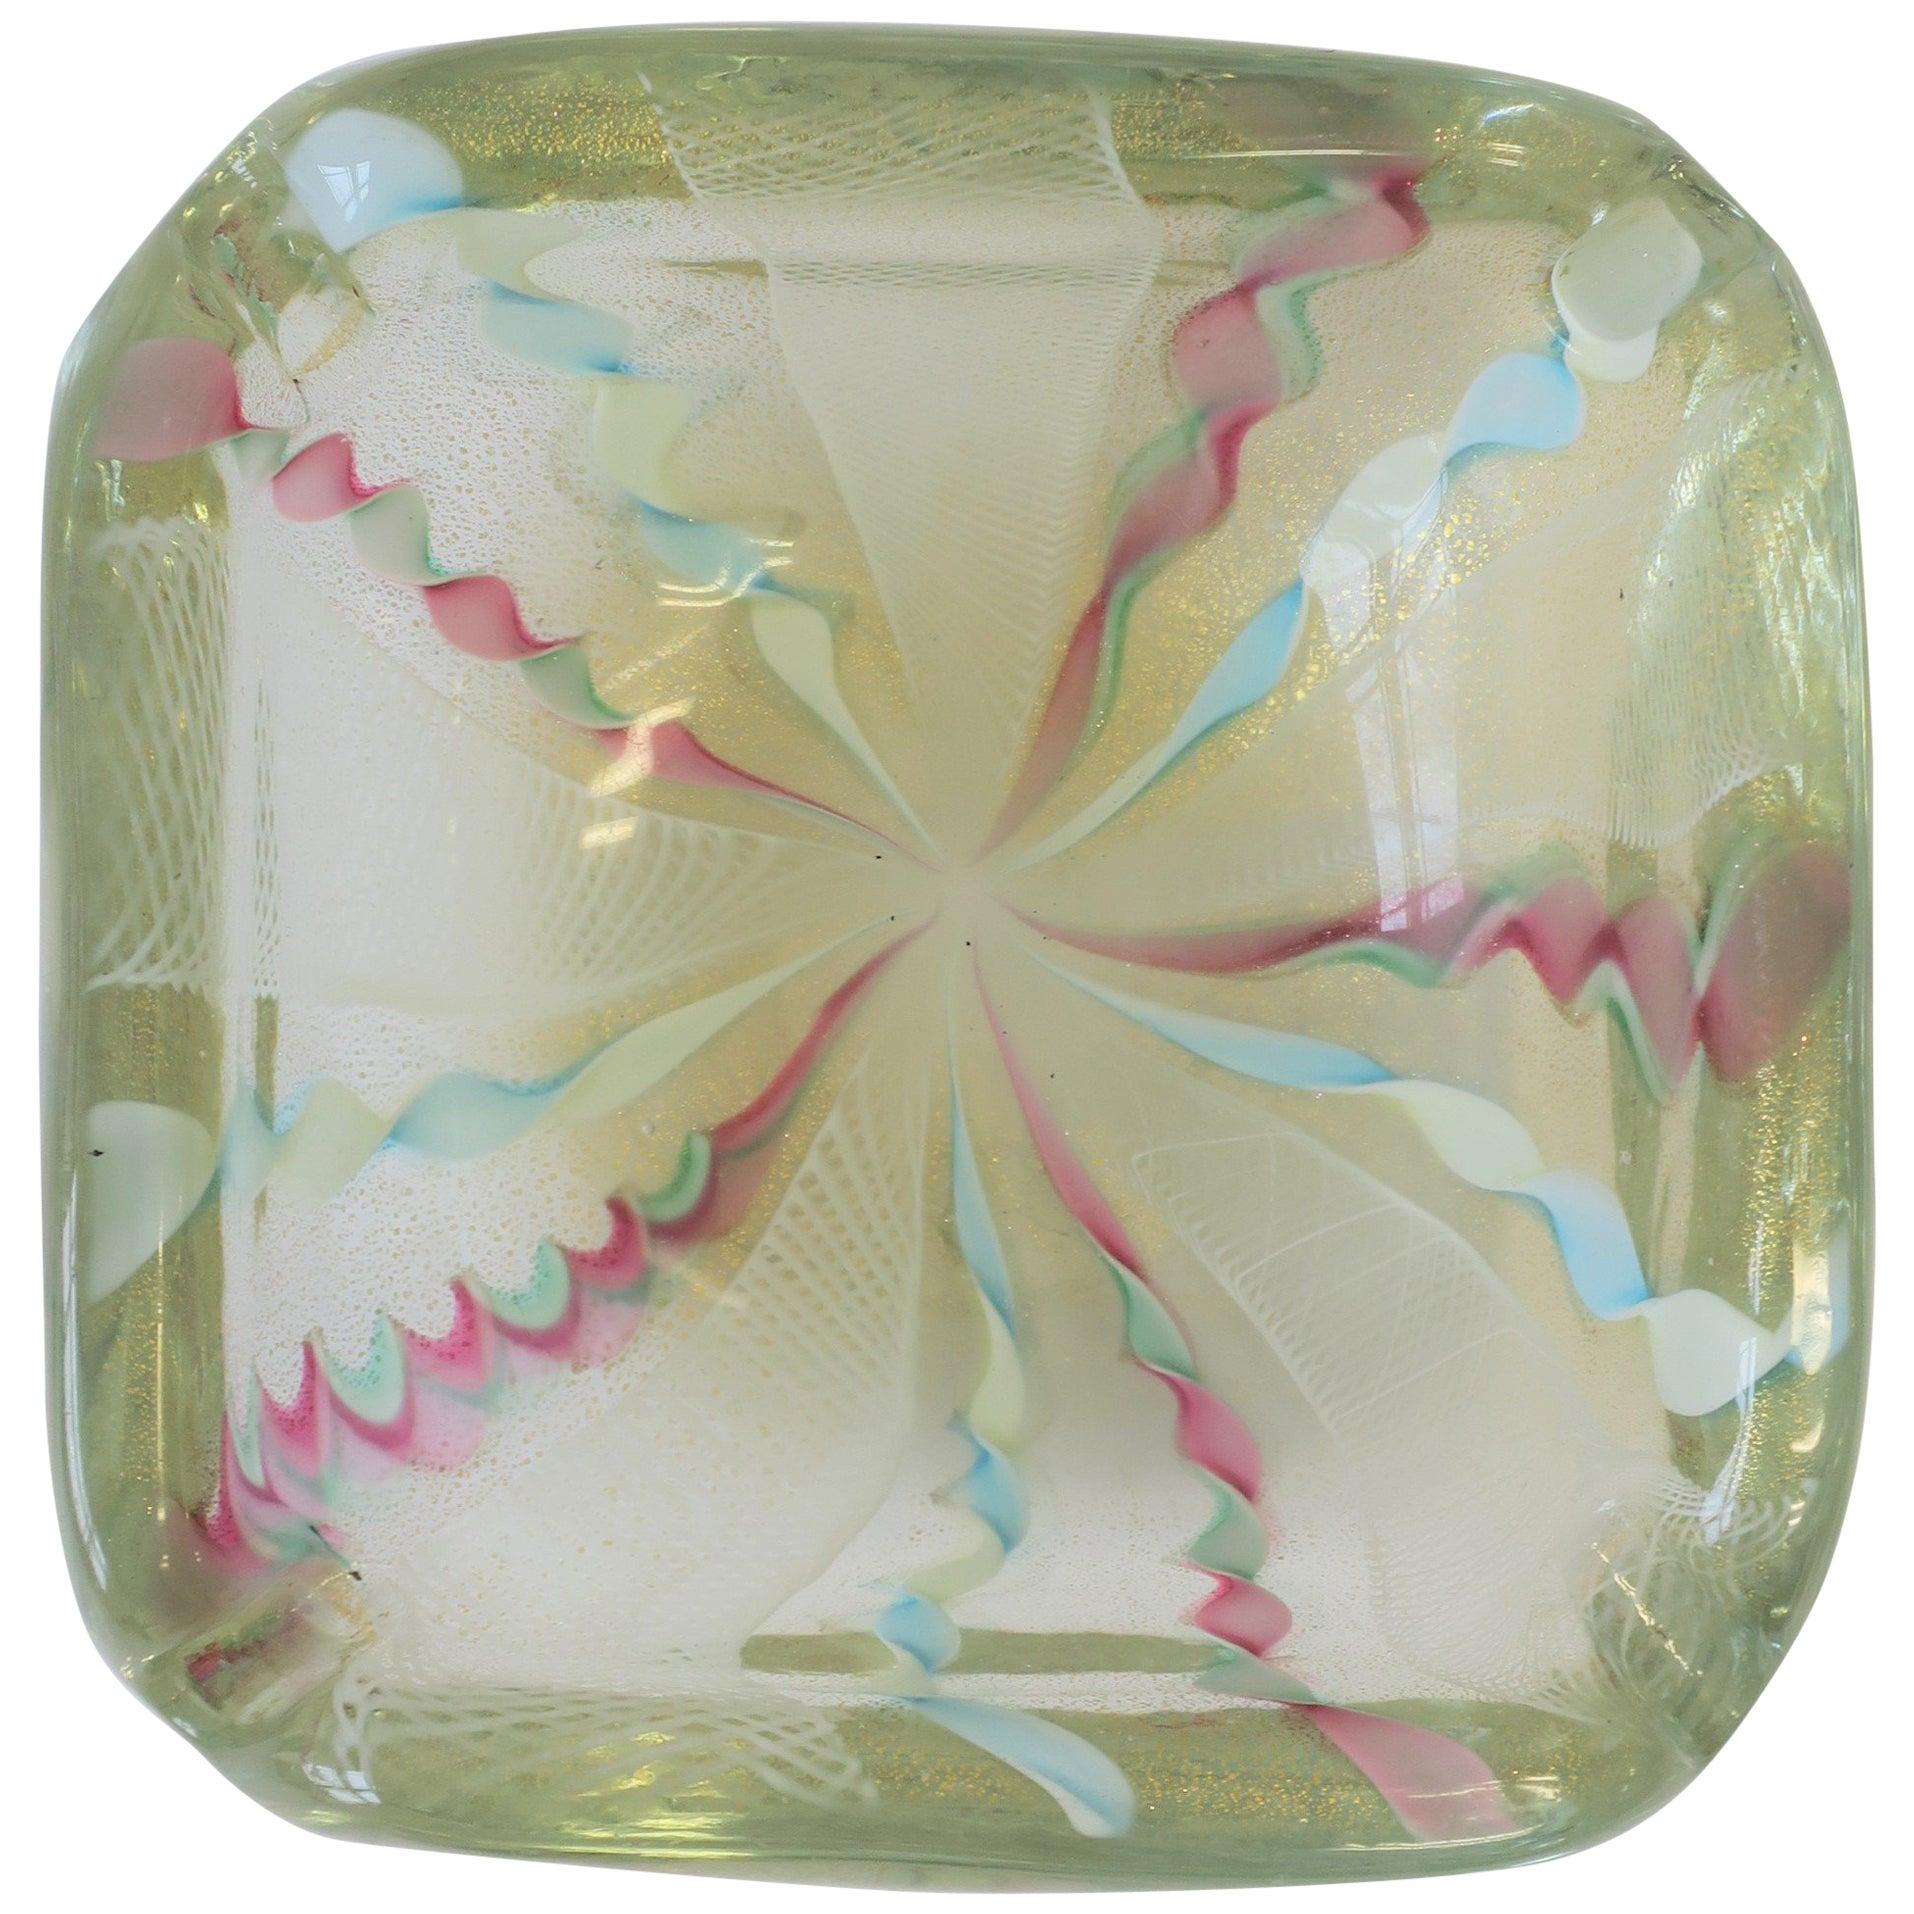 Italian Murano Fratelli Toso Pink Blue White & Gold Art Glass Bowl or Ashtray